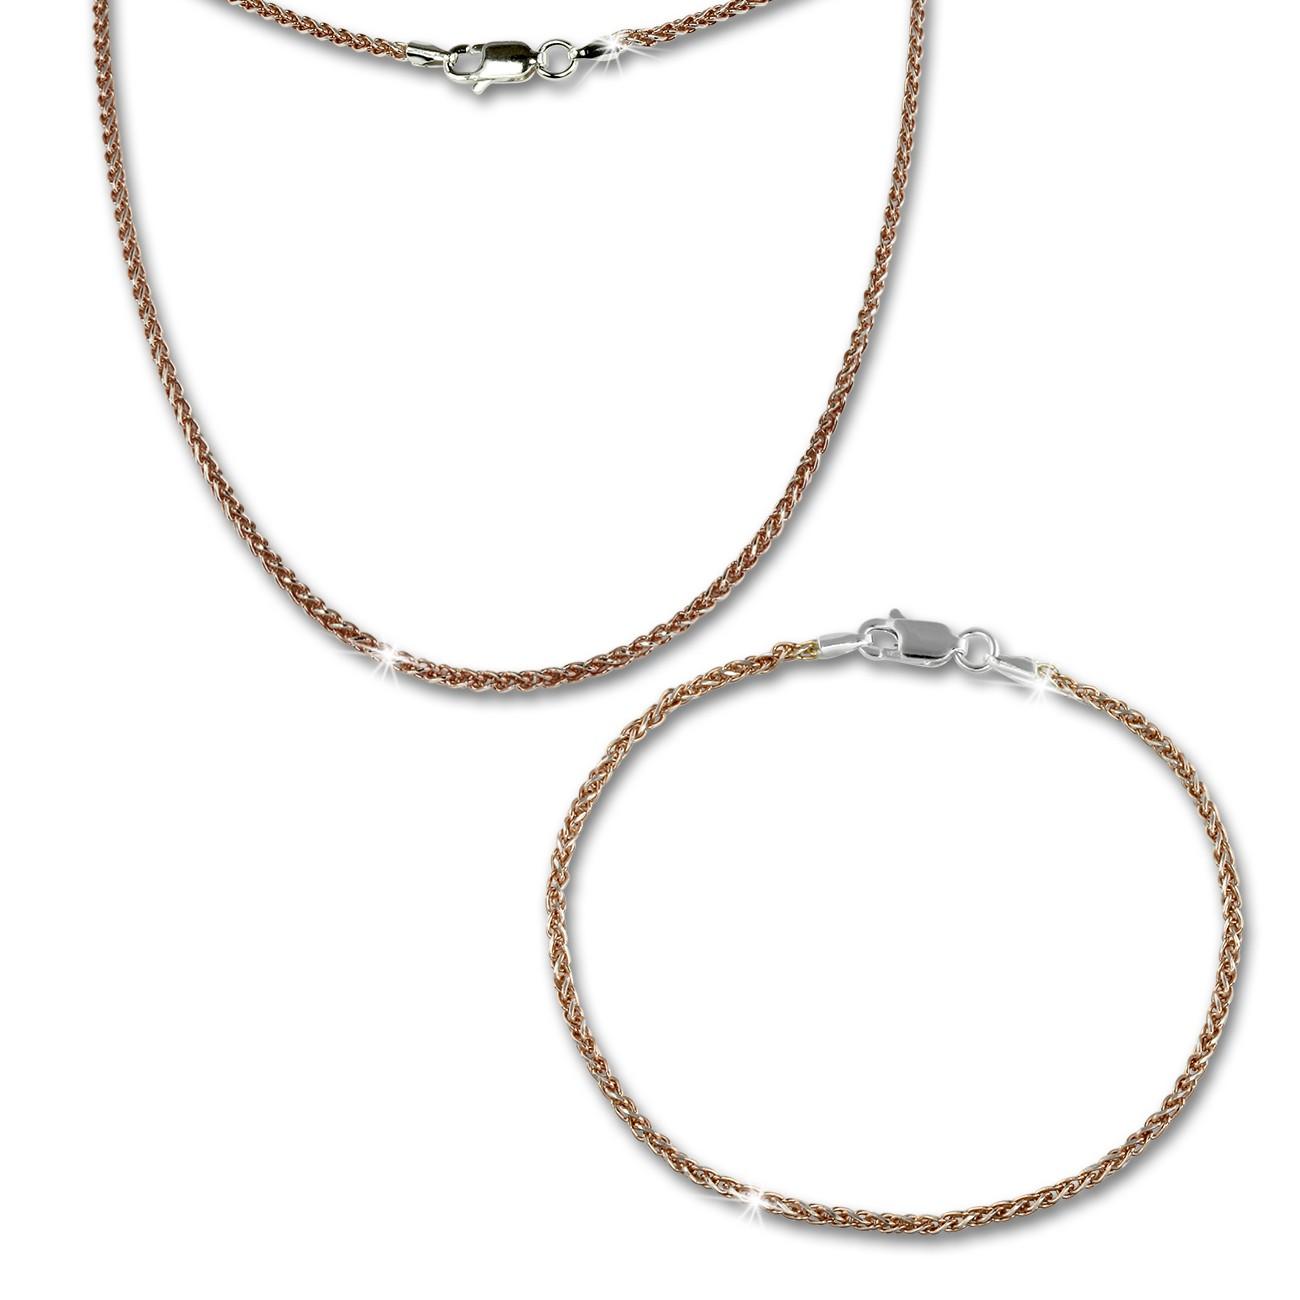 SilberDream Schmuckset Zopf Rose vergoldet Kette & Armband 925 Silber SDS206E